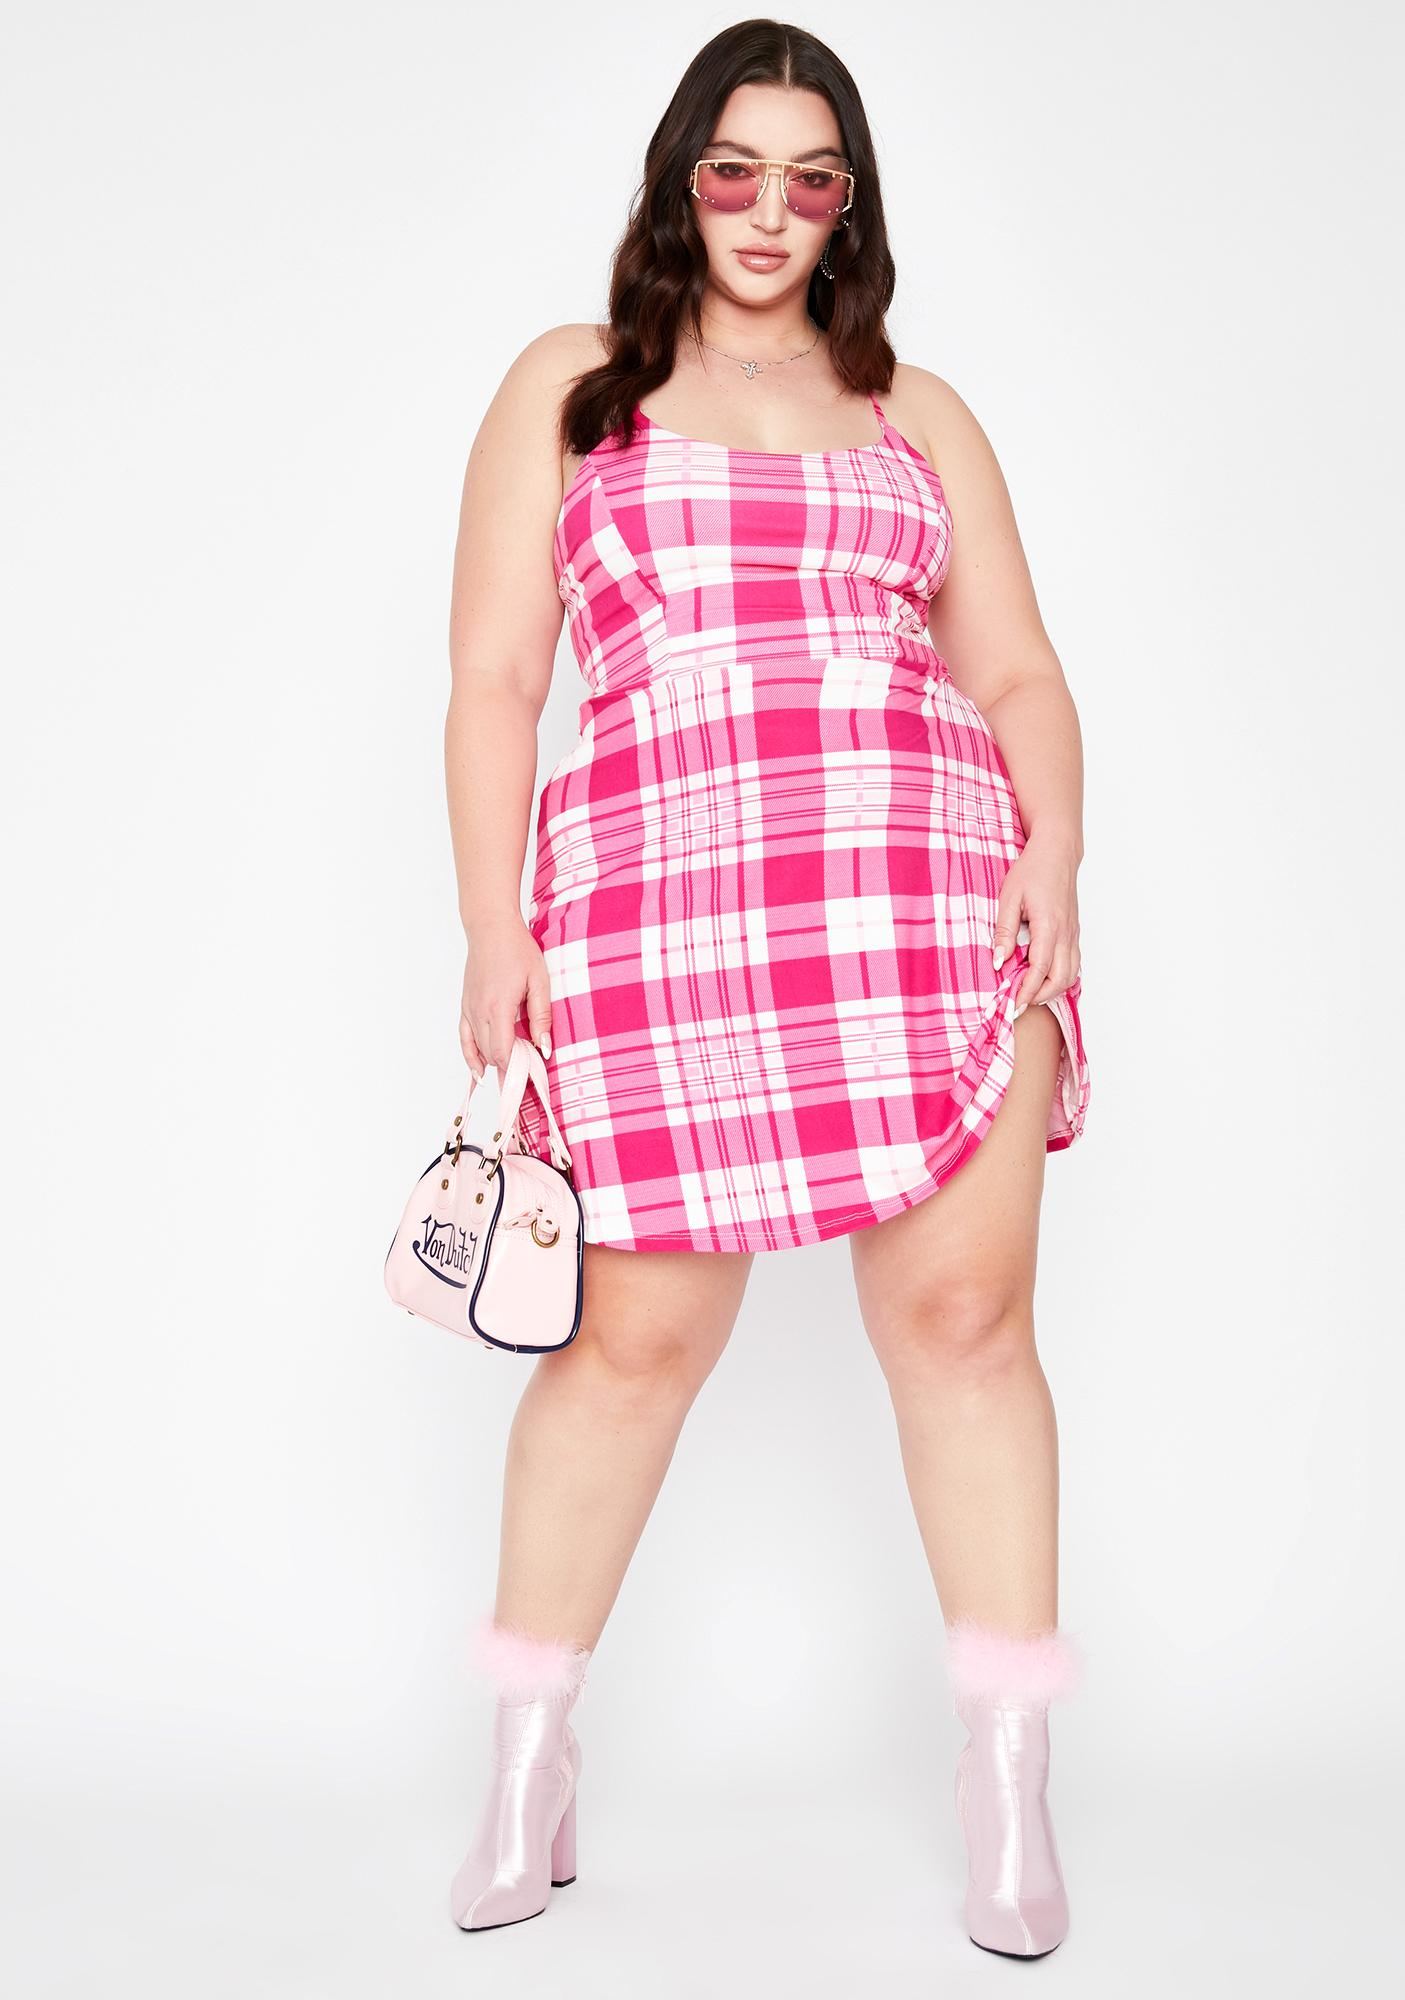 BB Plz No More Rules Plaid Dress